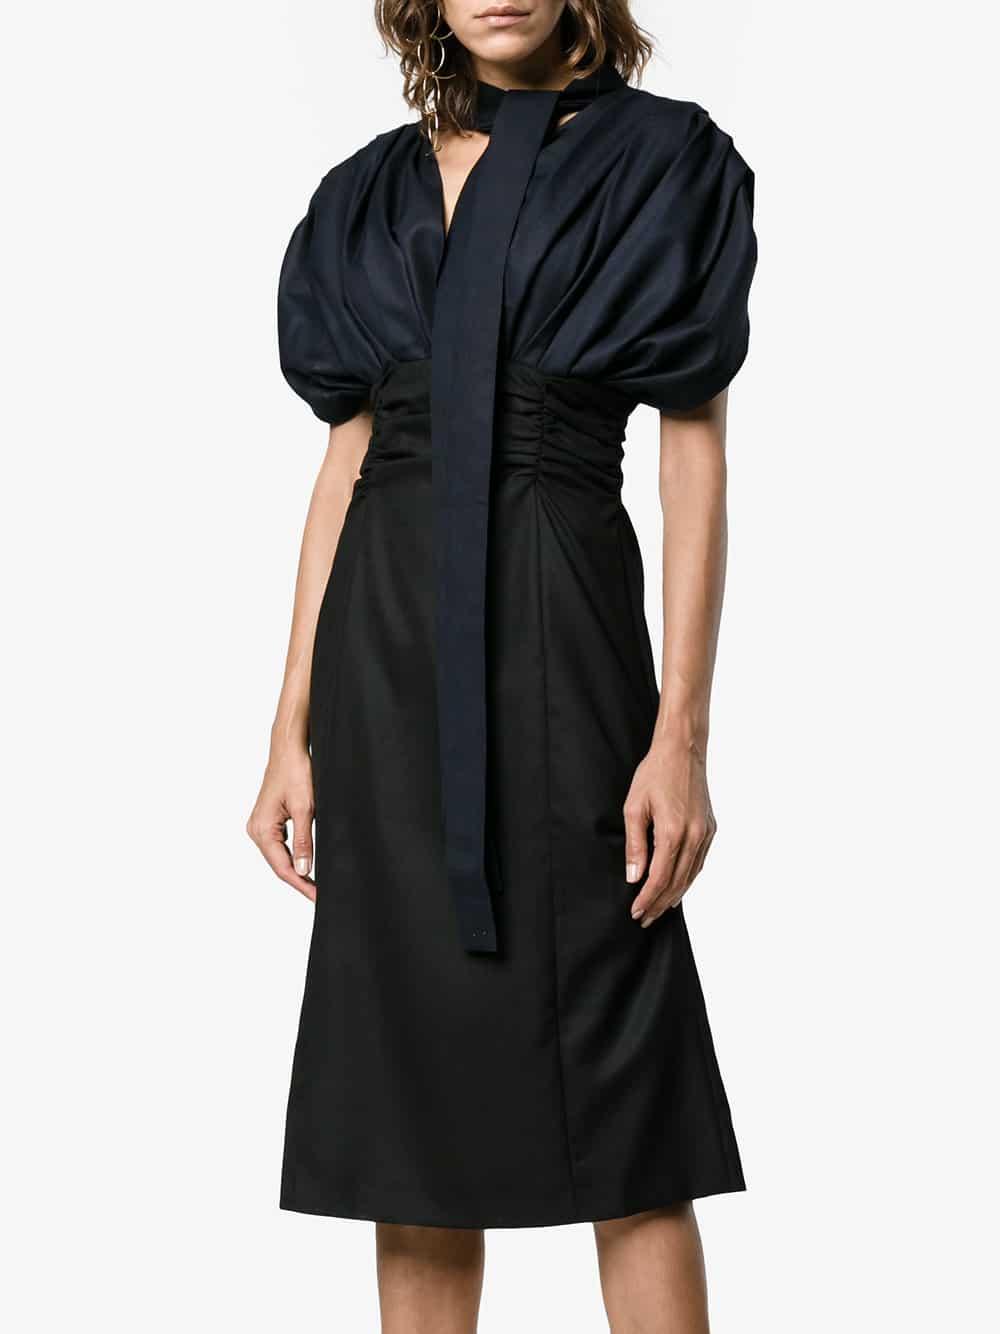 Jacquemus La Robe Madame Black Dress We Select Dresses